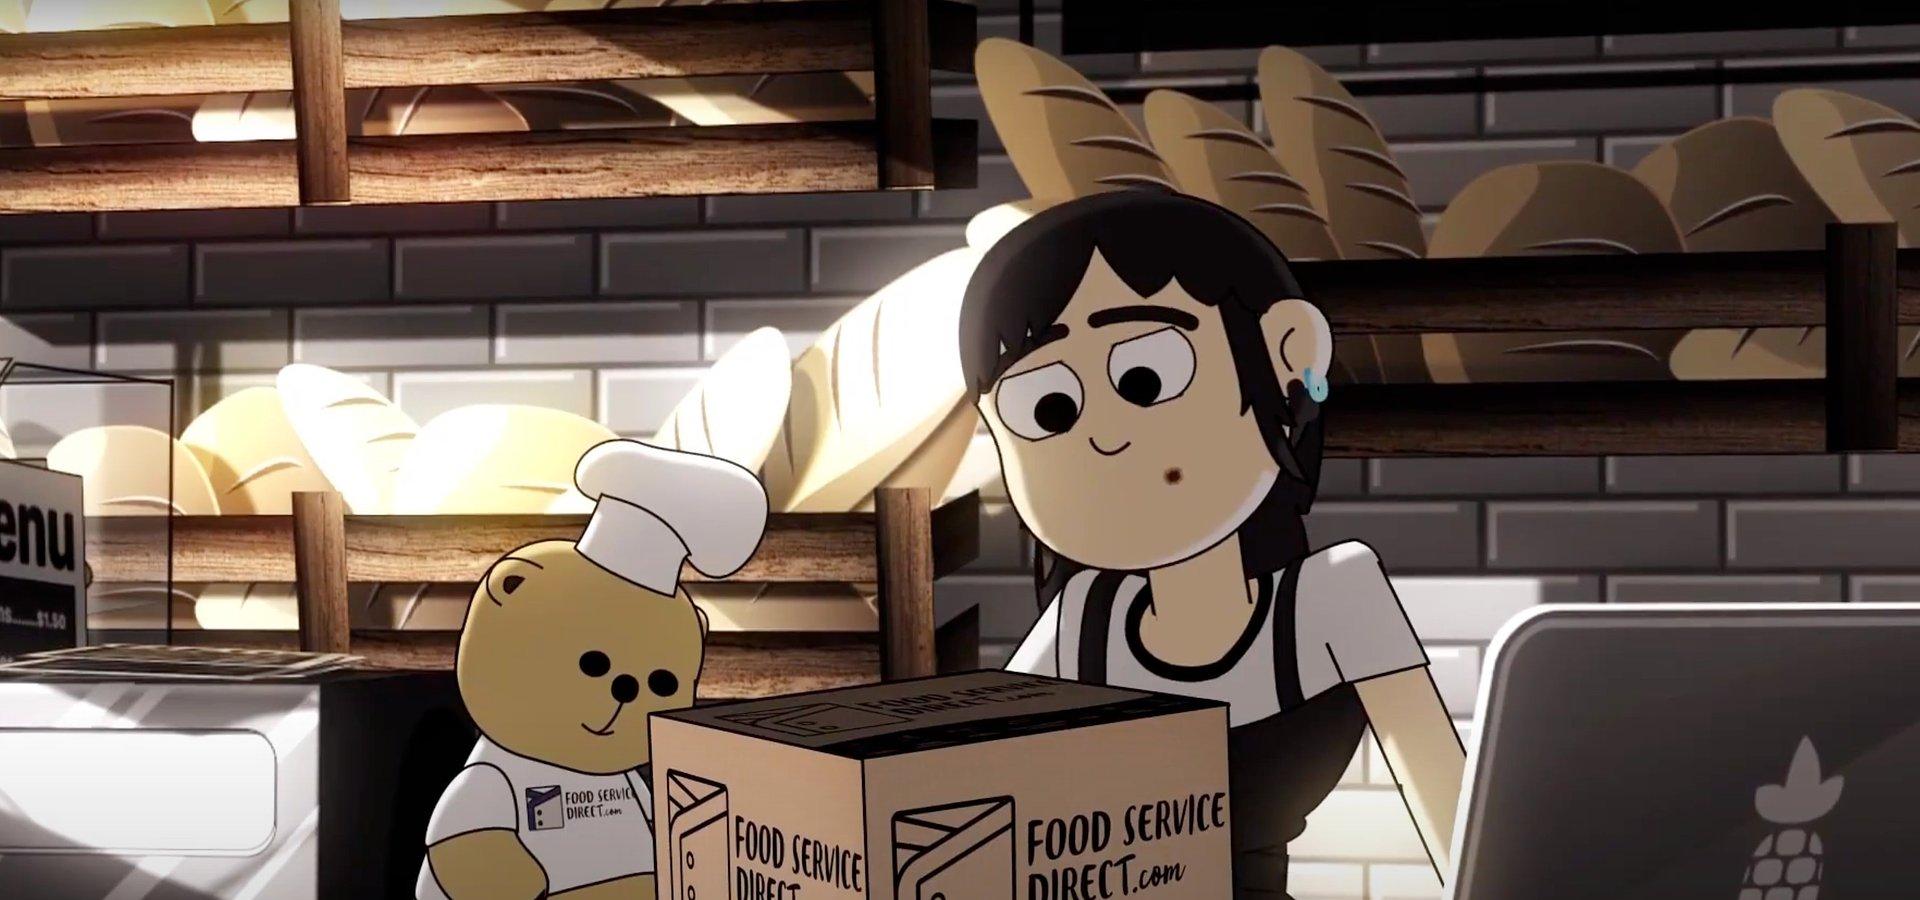 FoodServiceDirect.com Supplies Food Trucks